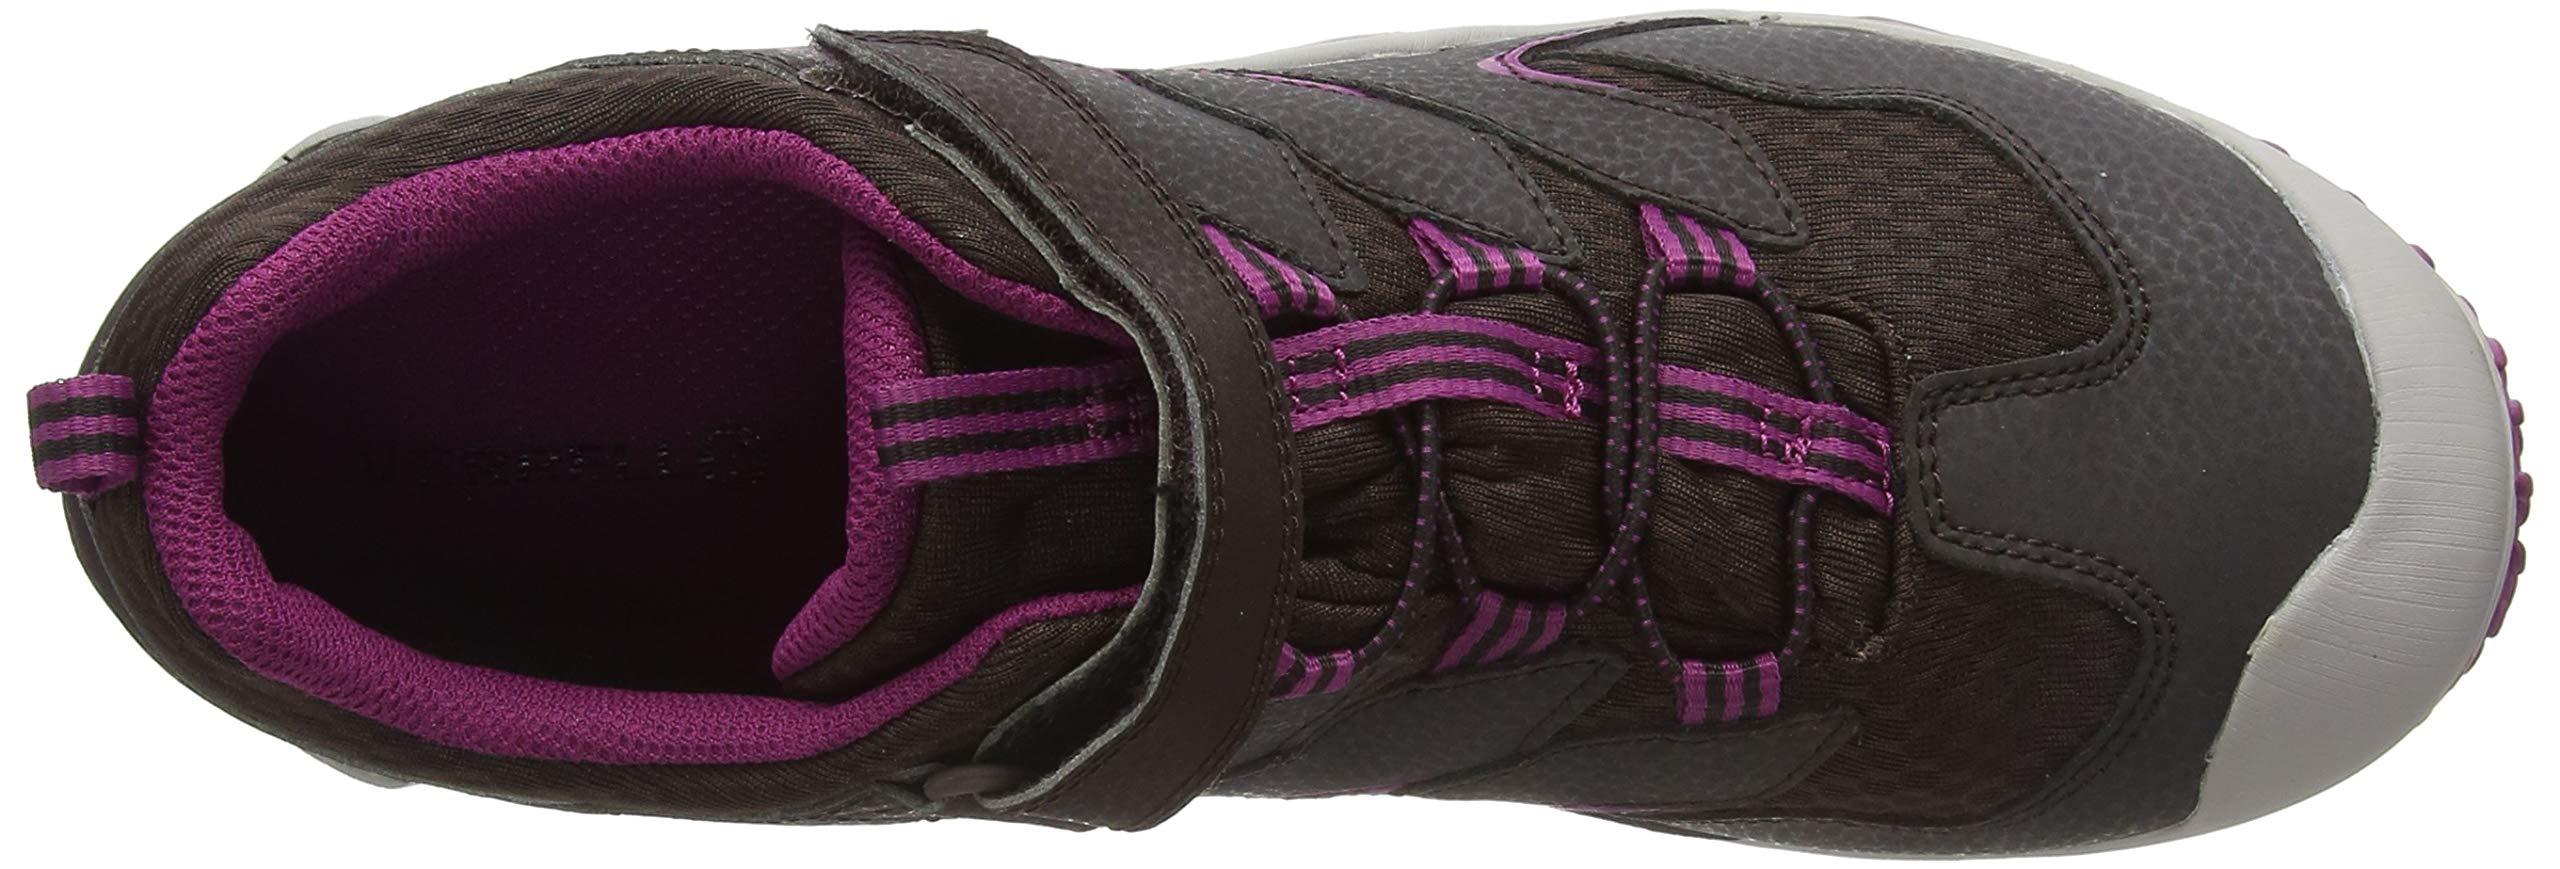 Merrell Unisex Kids M-Chameleon 7 Low a/C Waterproof Rise Hiking Boots 7